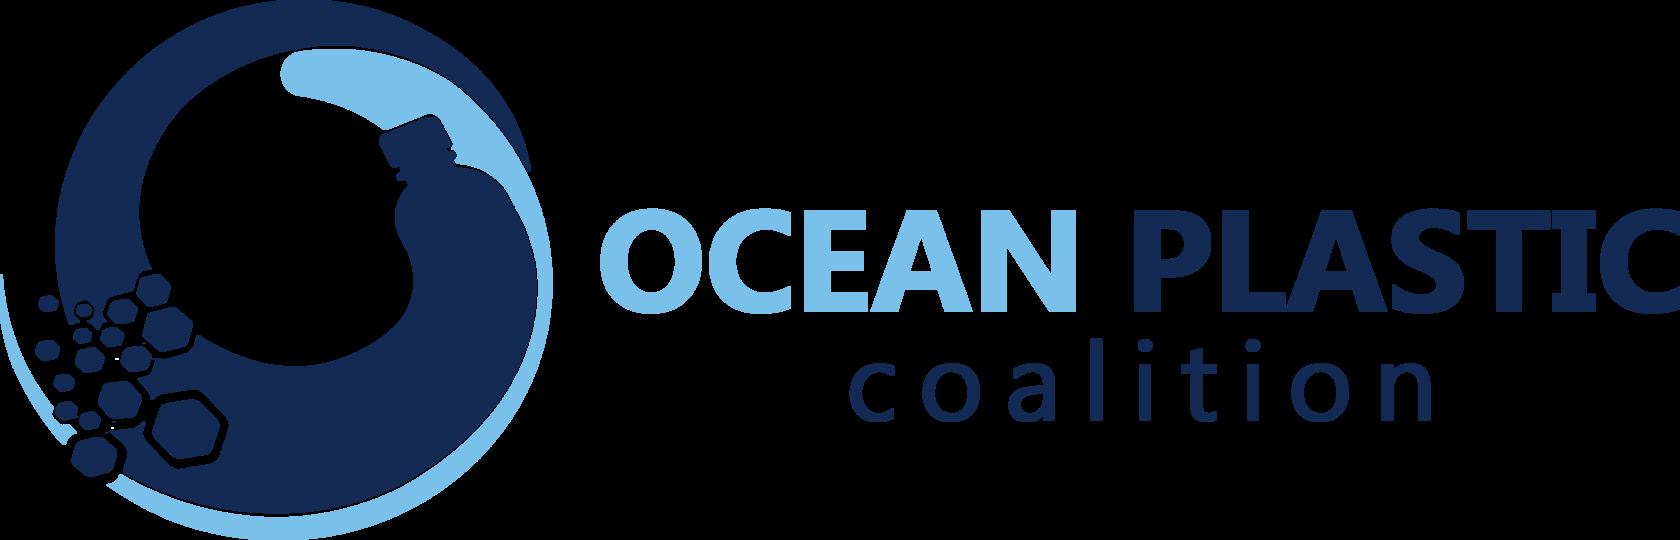 Ocean Plastic Coalition